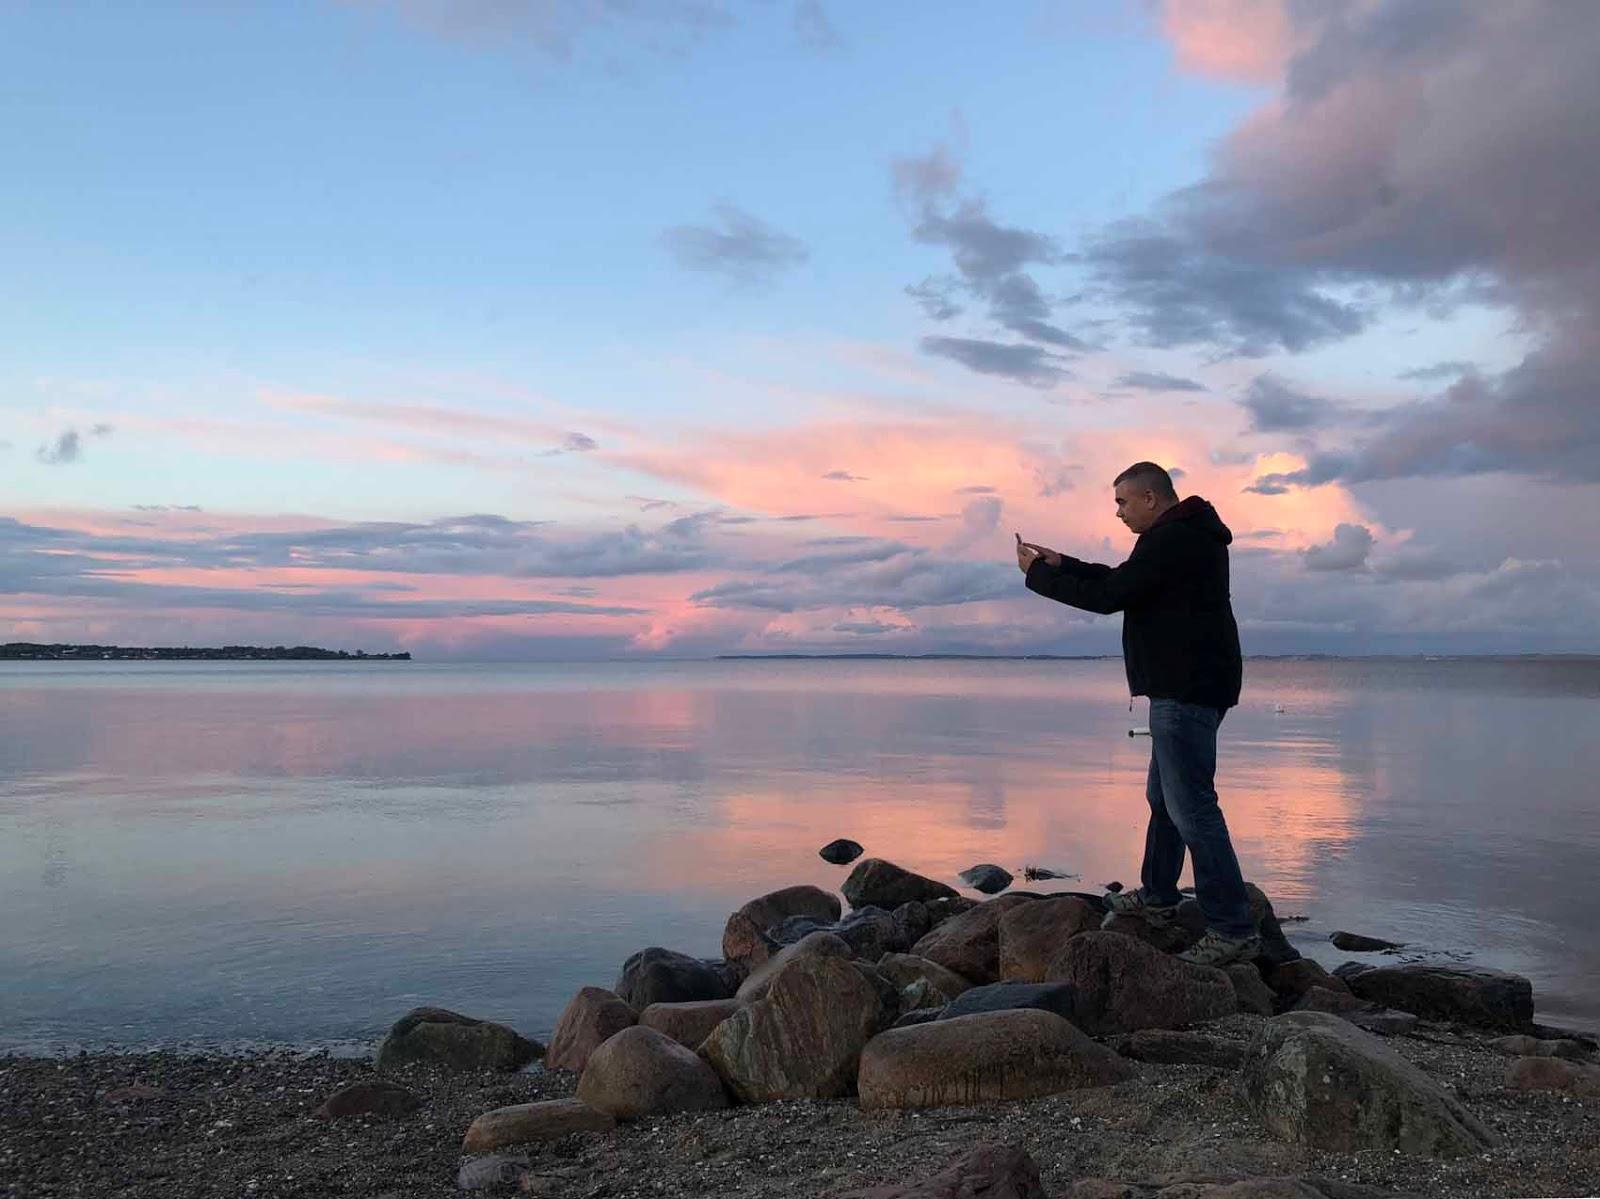 Thurø IlkkaPlaysPokemon Pokemon ranta meri auringonlasku